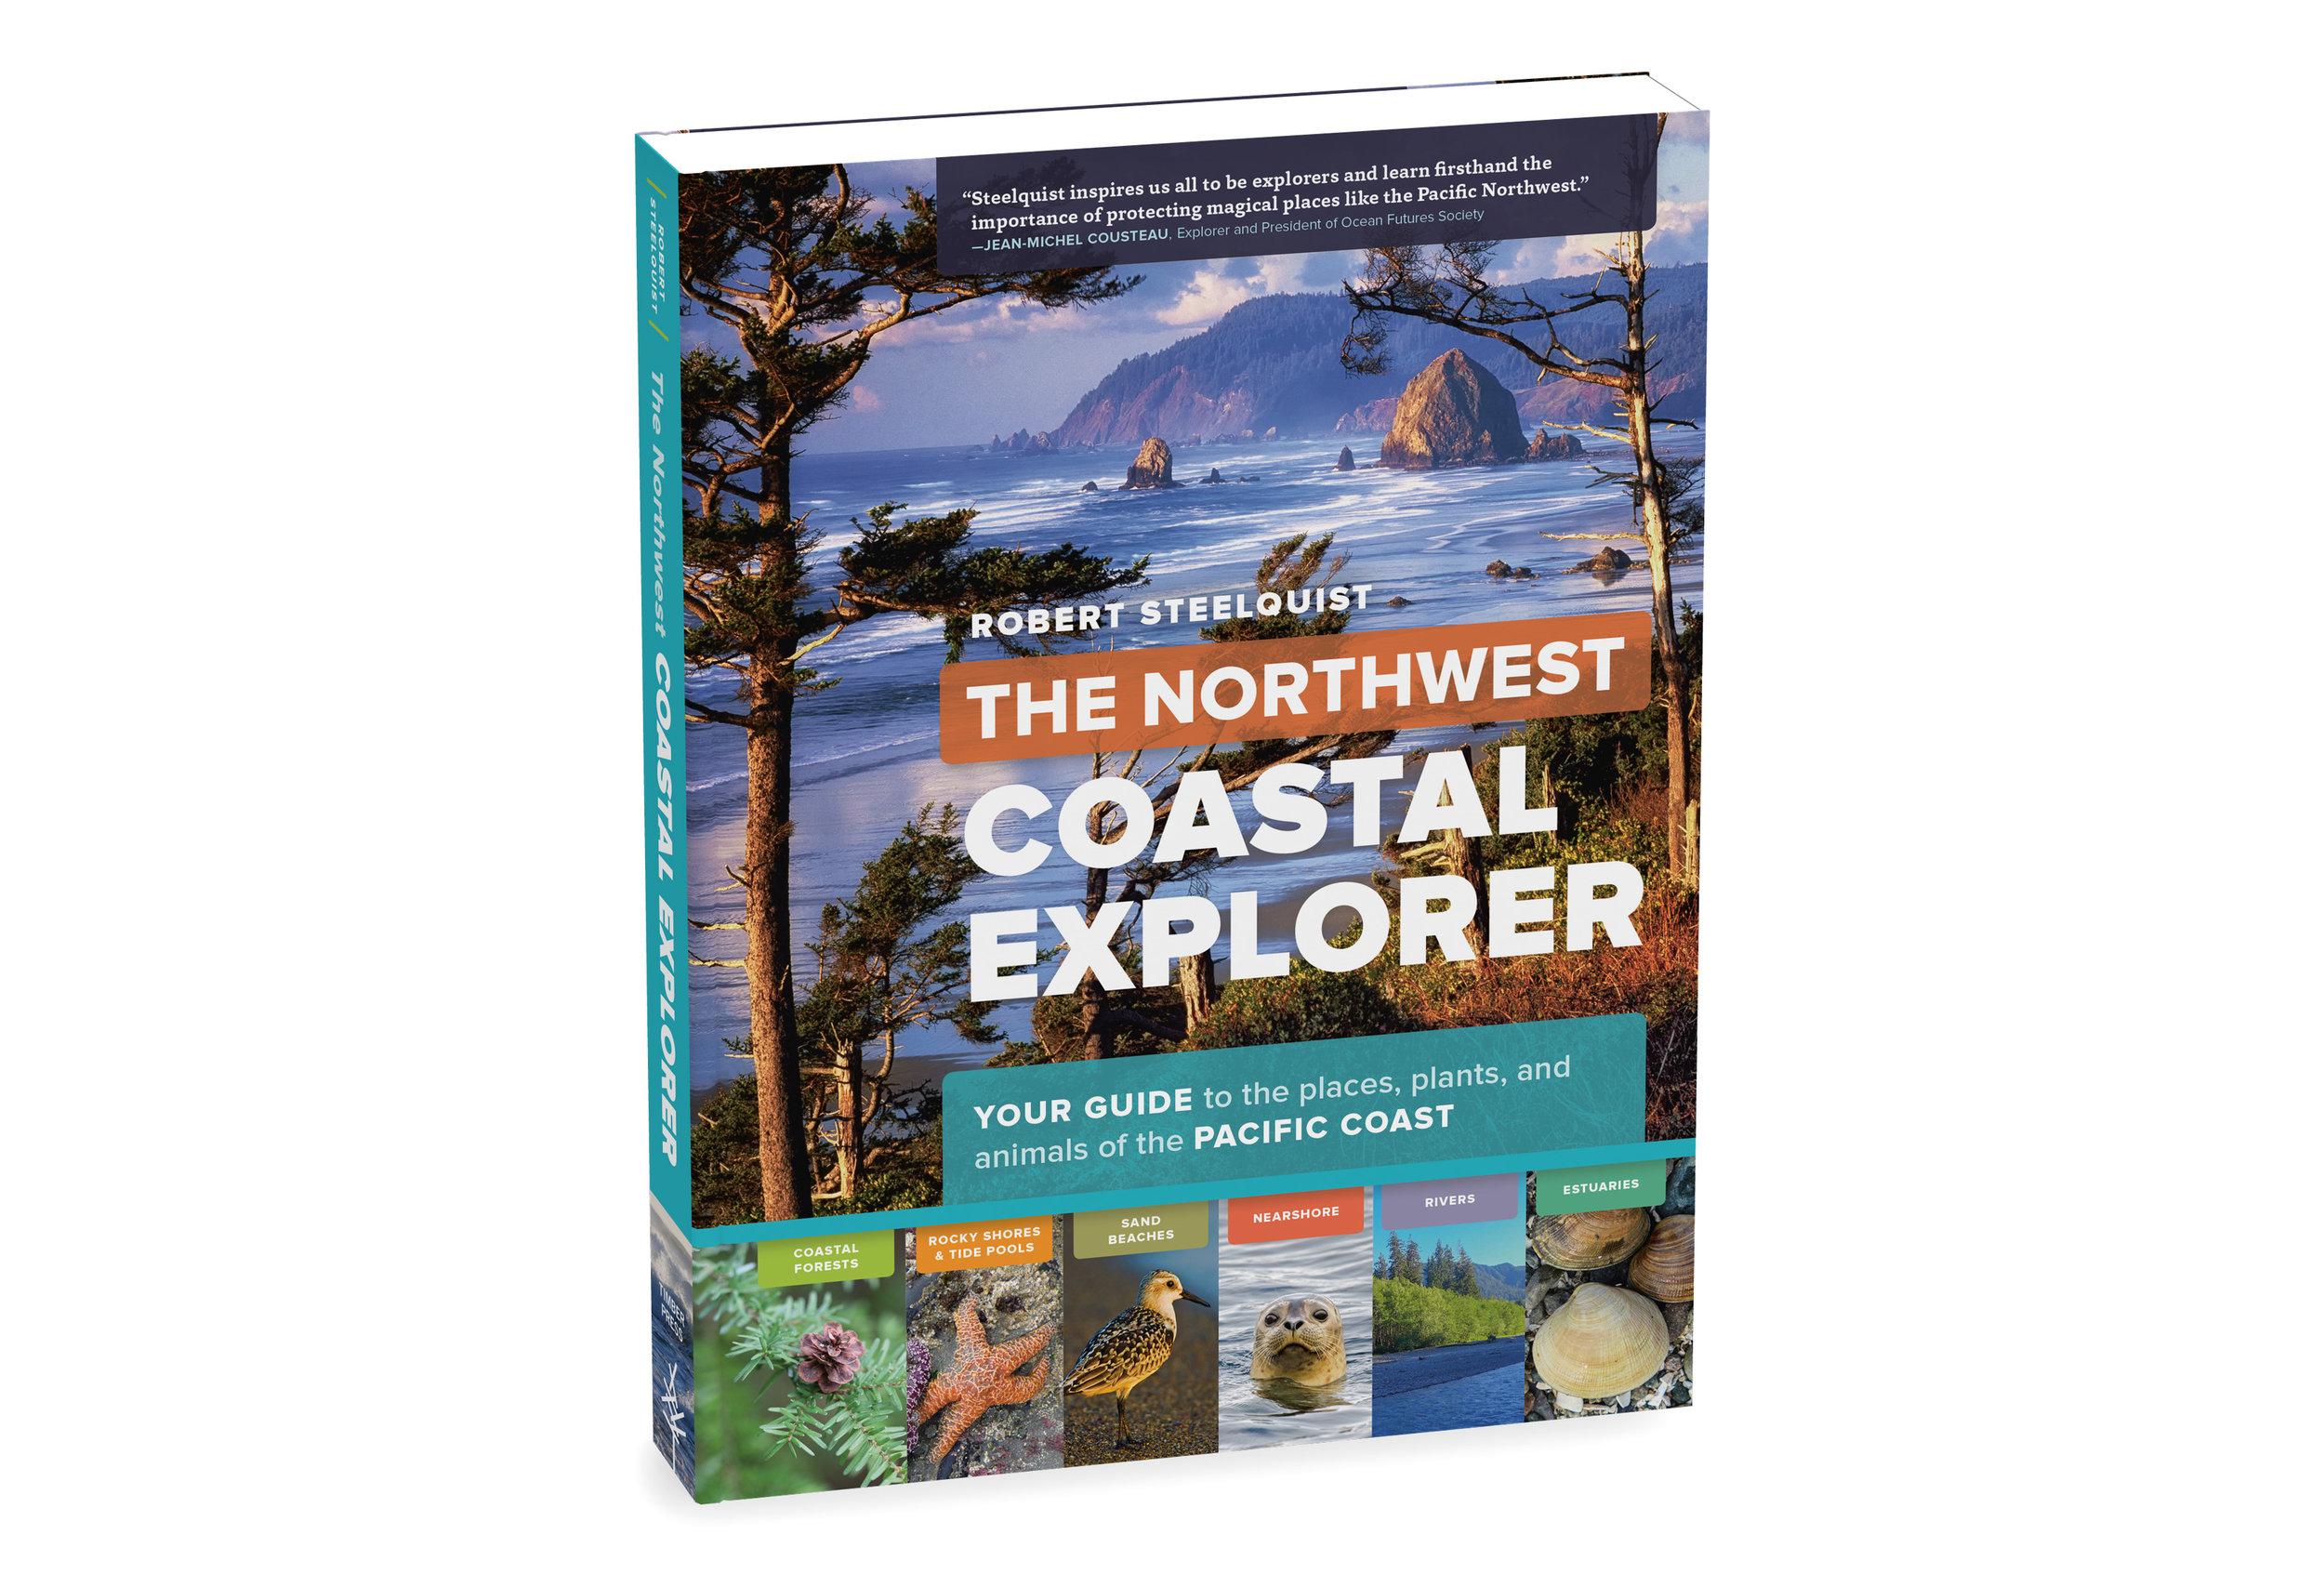 book_coastalex_cover_003.jpg